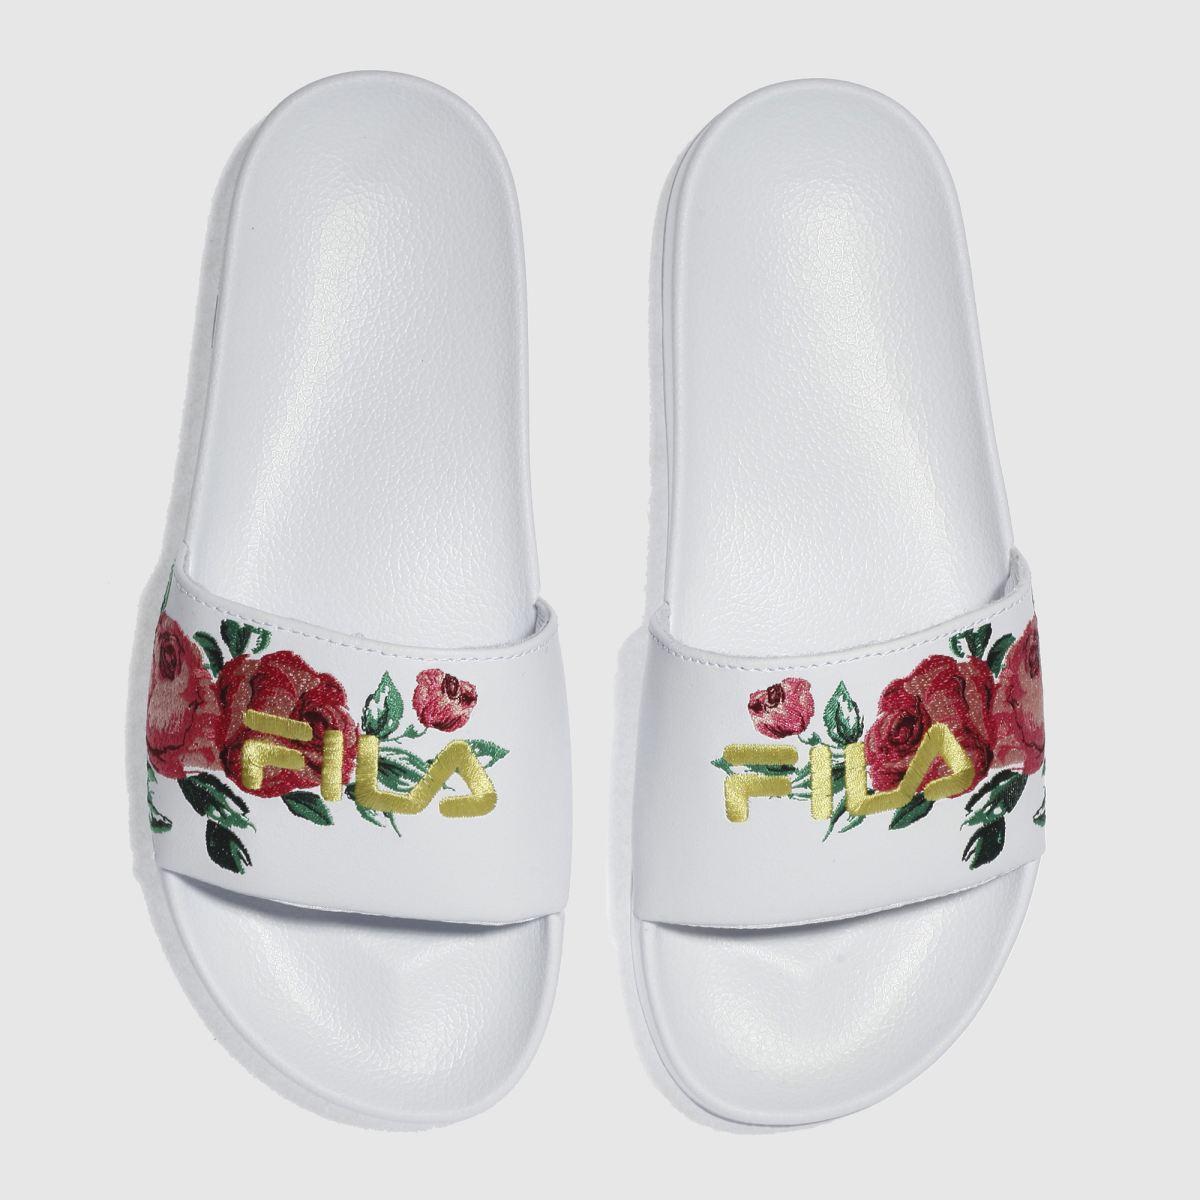 Fila Fila White & Pink Drifter Embroidery Sandals